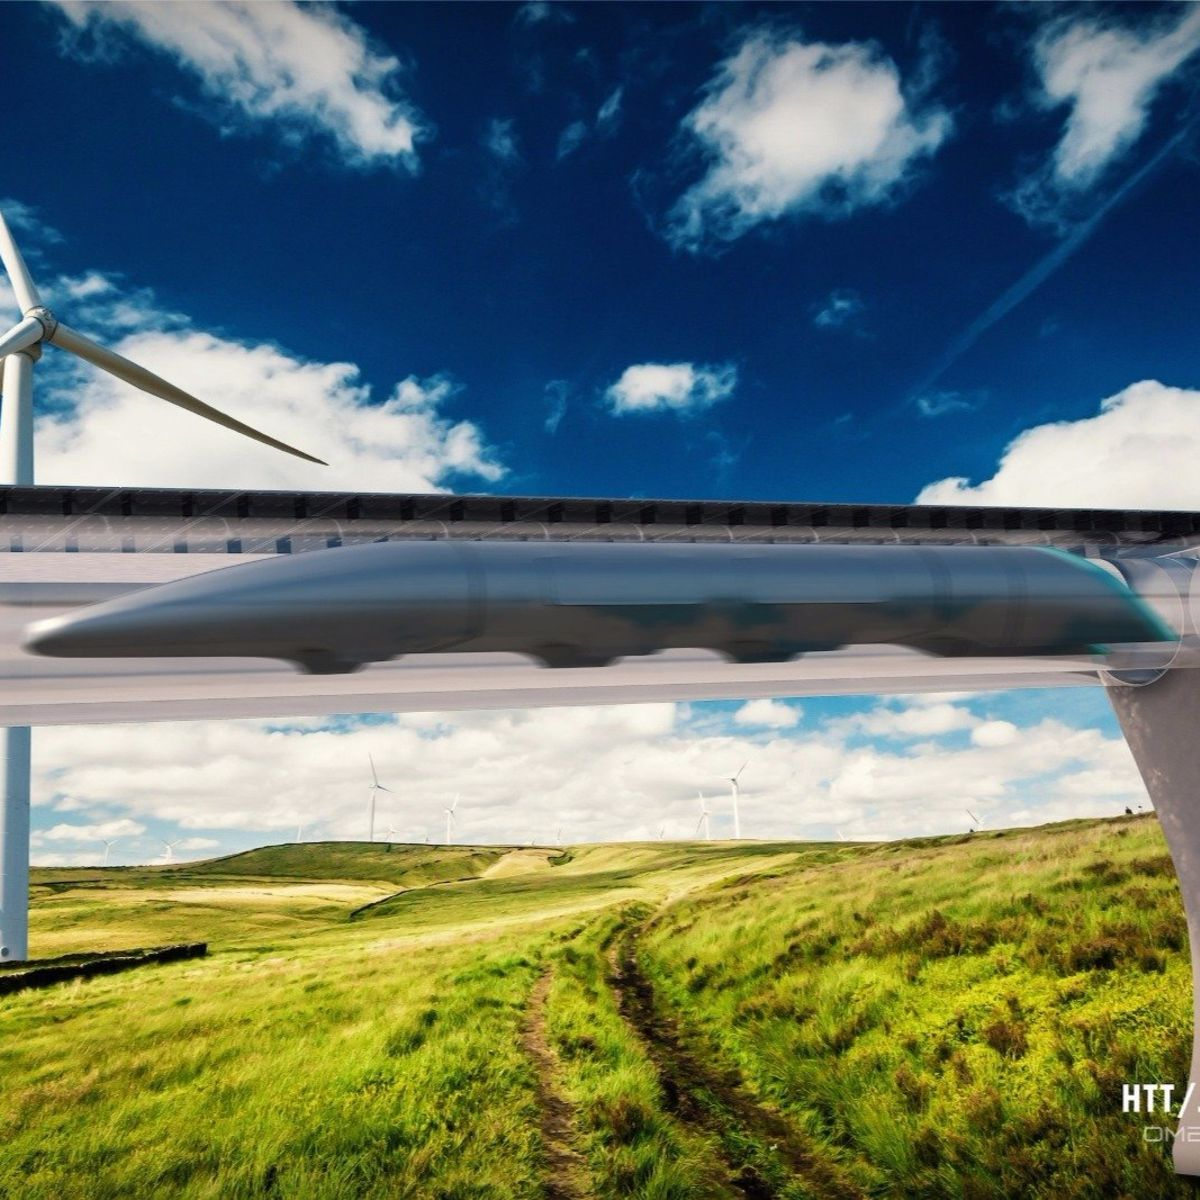 htt_hyperloop.jpeg